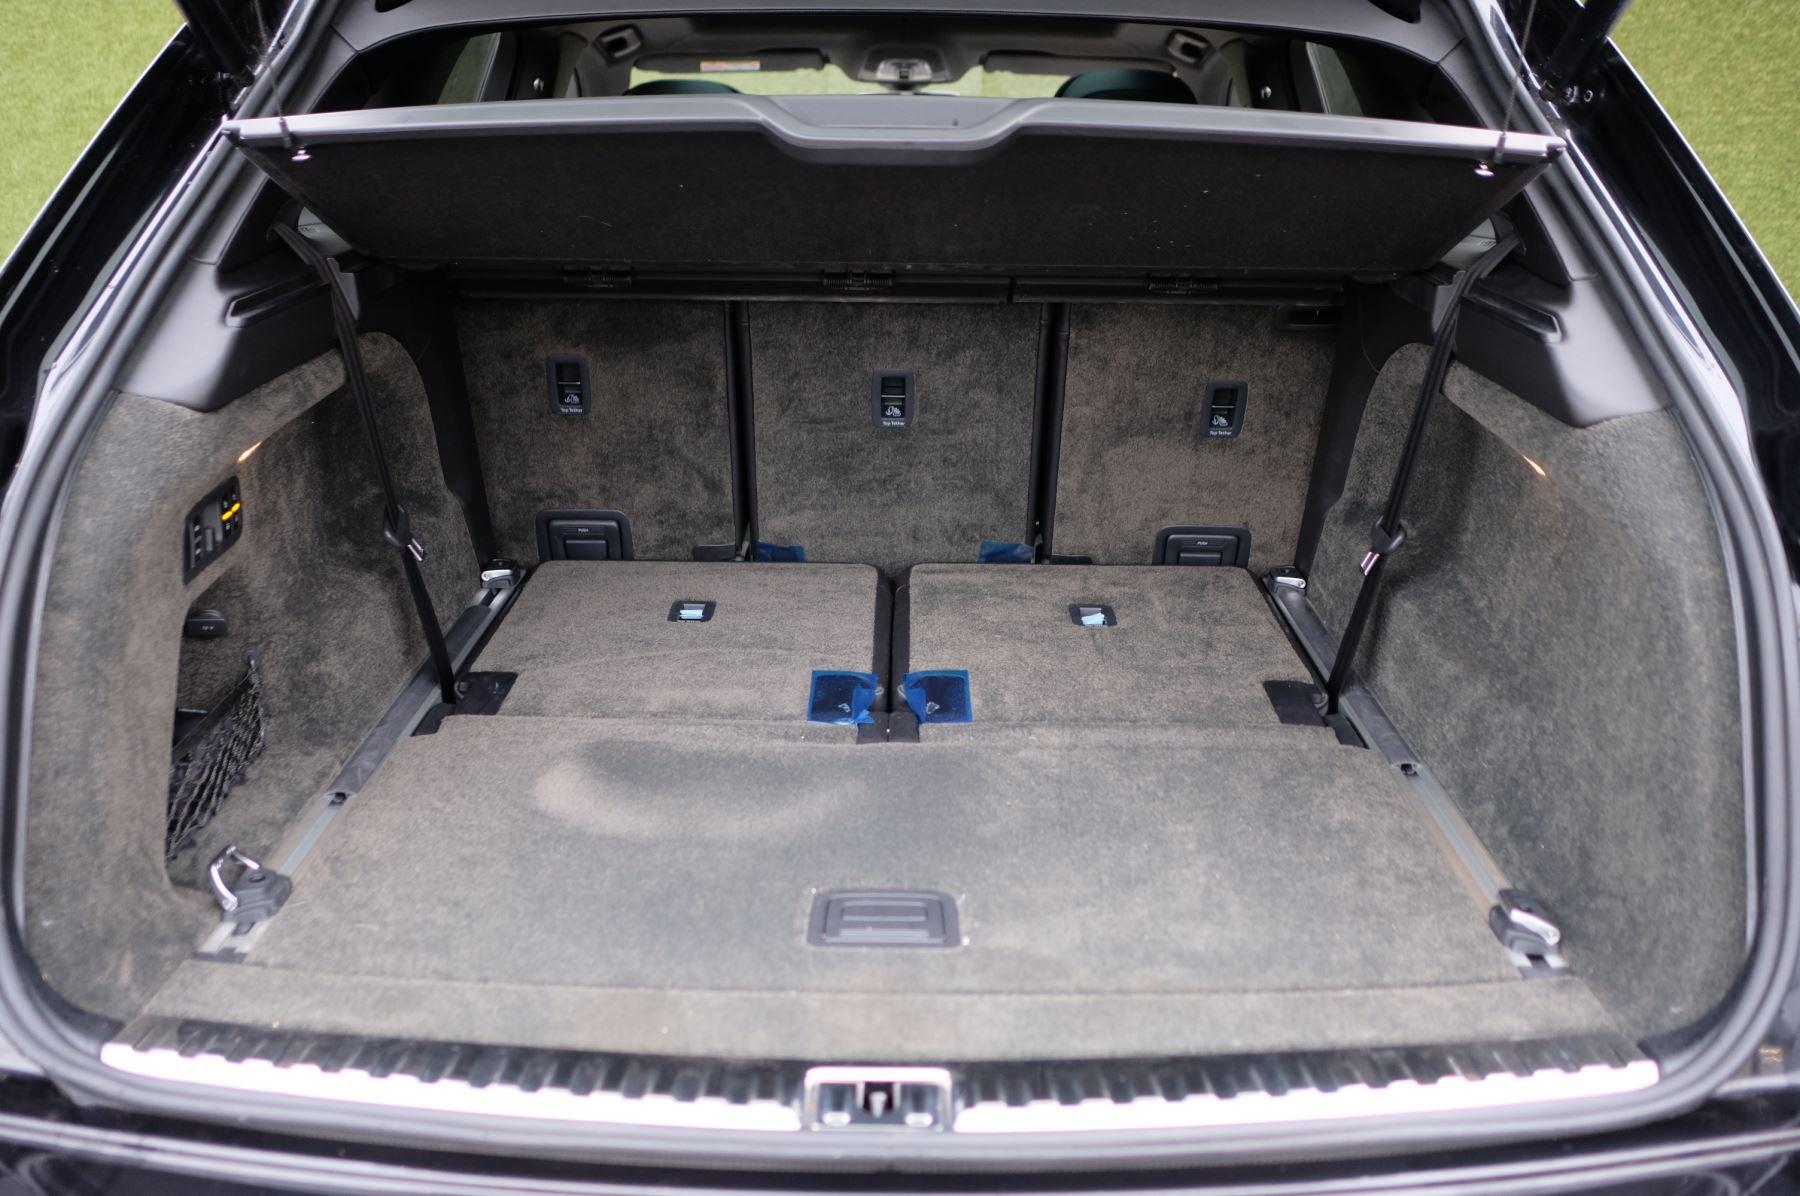 Bentley Bentayga Diesel 4.0 V8 Mulliner Driving Spec 5dr Auto - 7 Seat Specification image 9